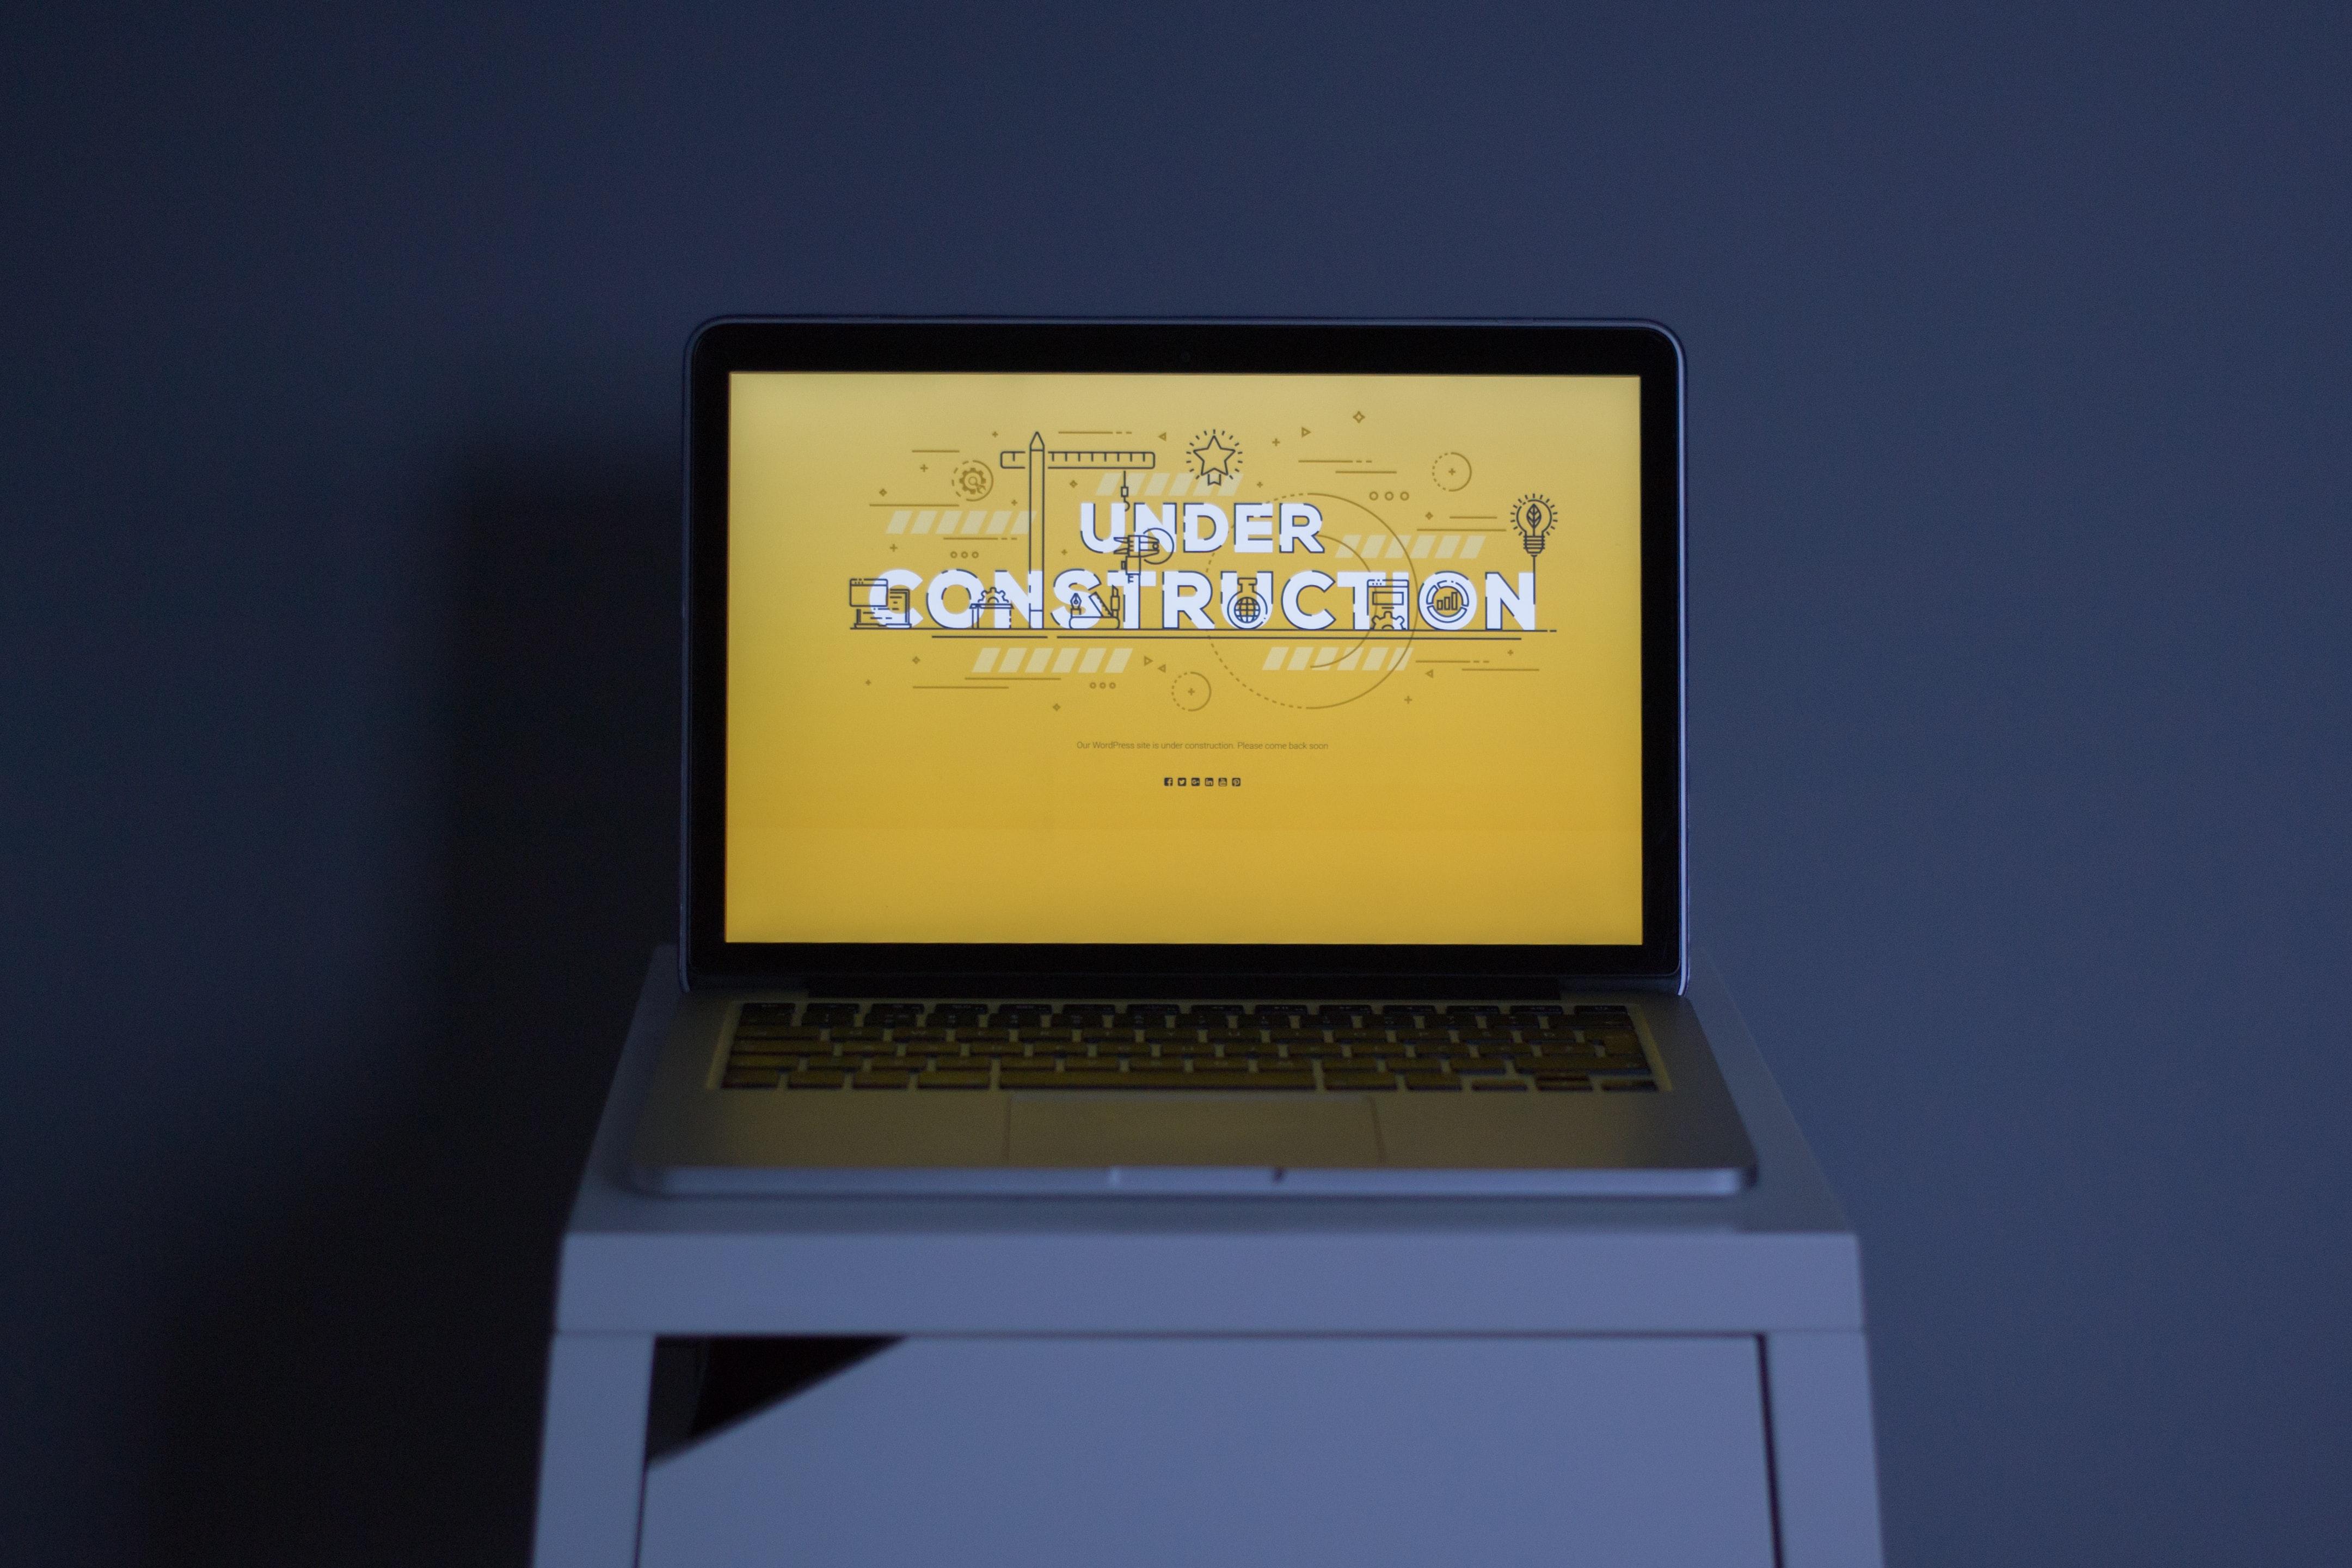 webfactory-ltd-NoOrDKxUfzo-unsplash